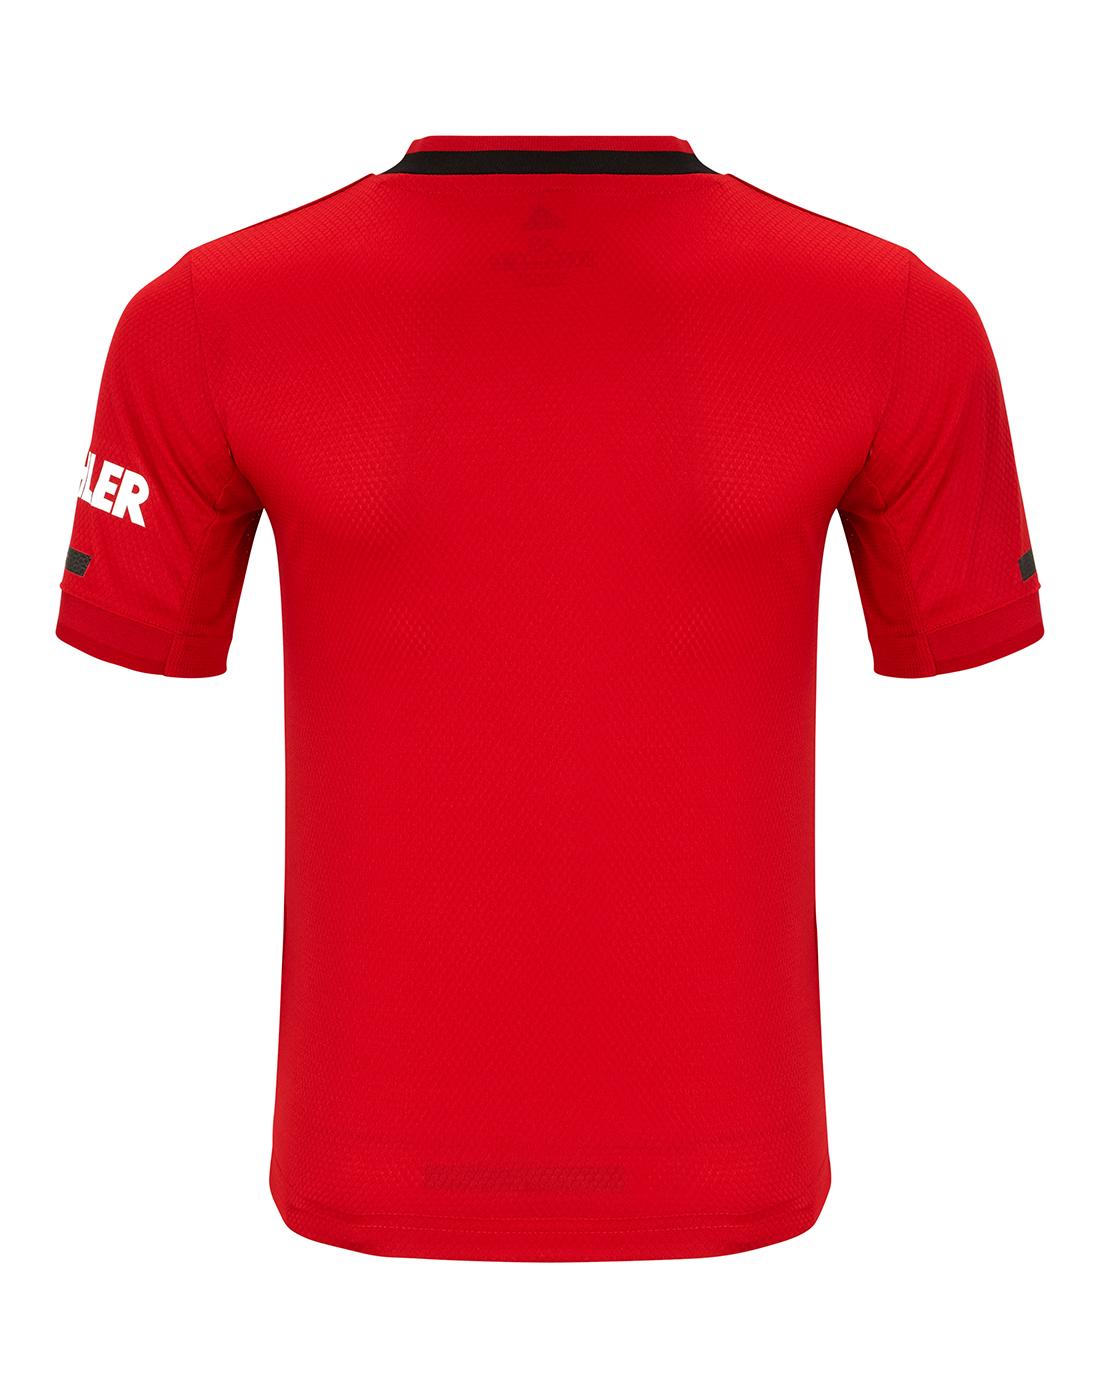 32c81da1416 ... Kids Man Utd 19 20 Home Jersey ...